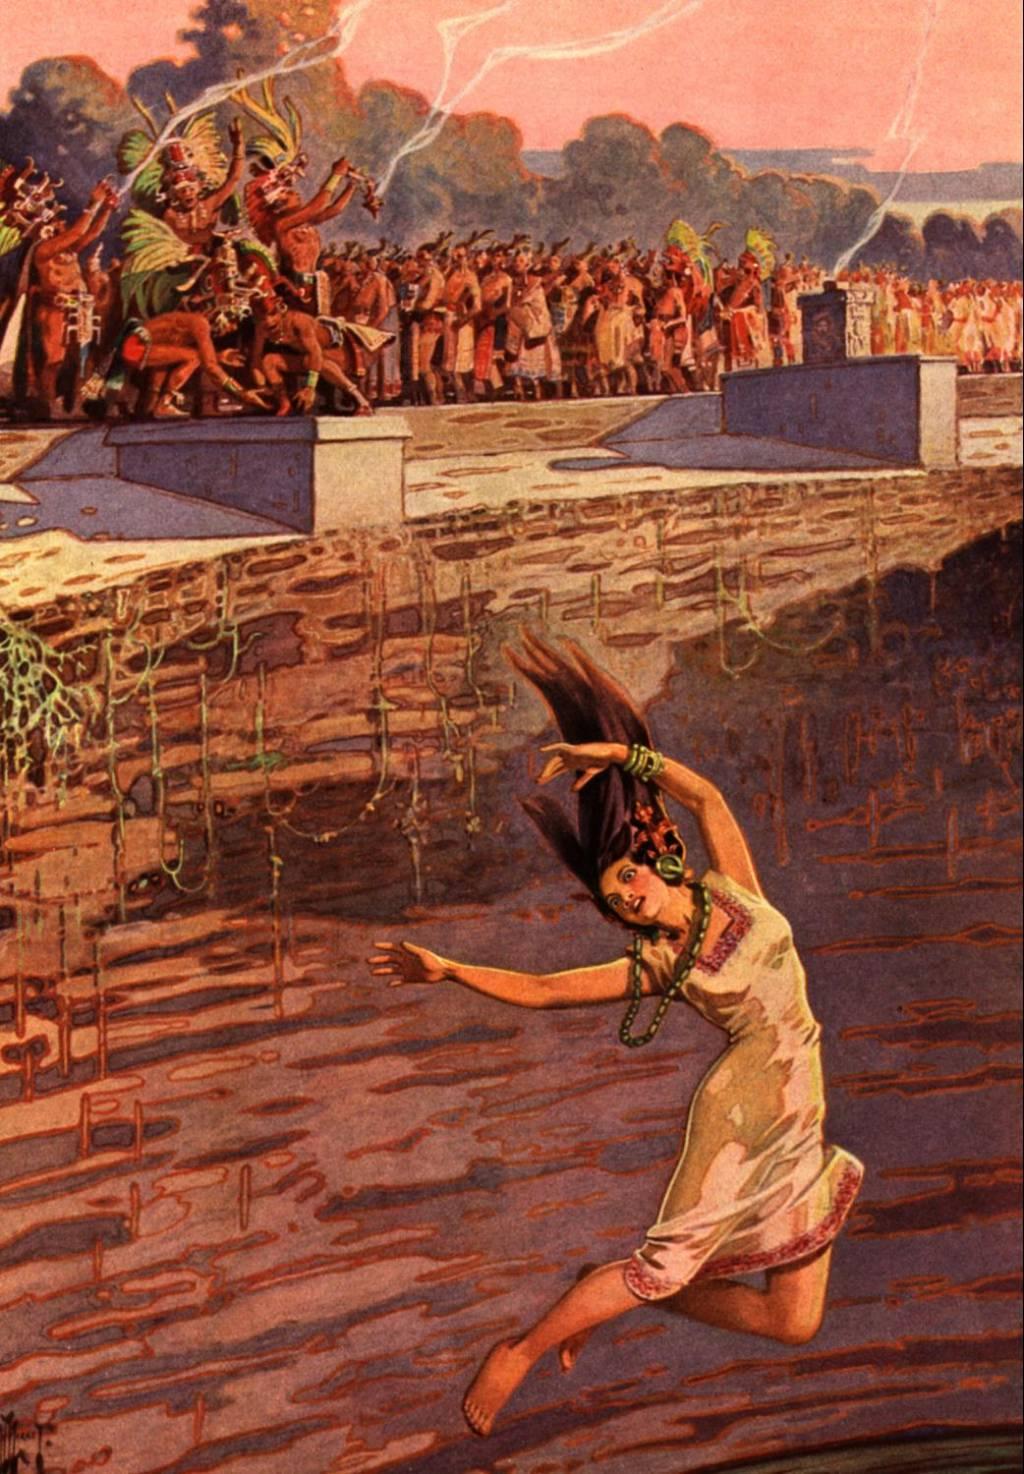 Young female human sacrifice exploited image